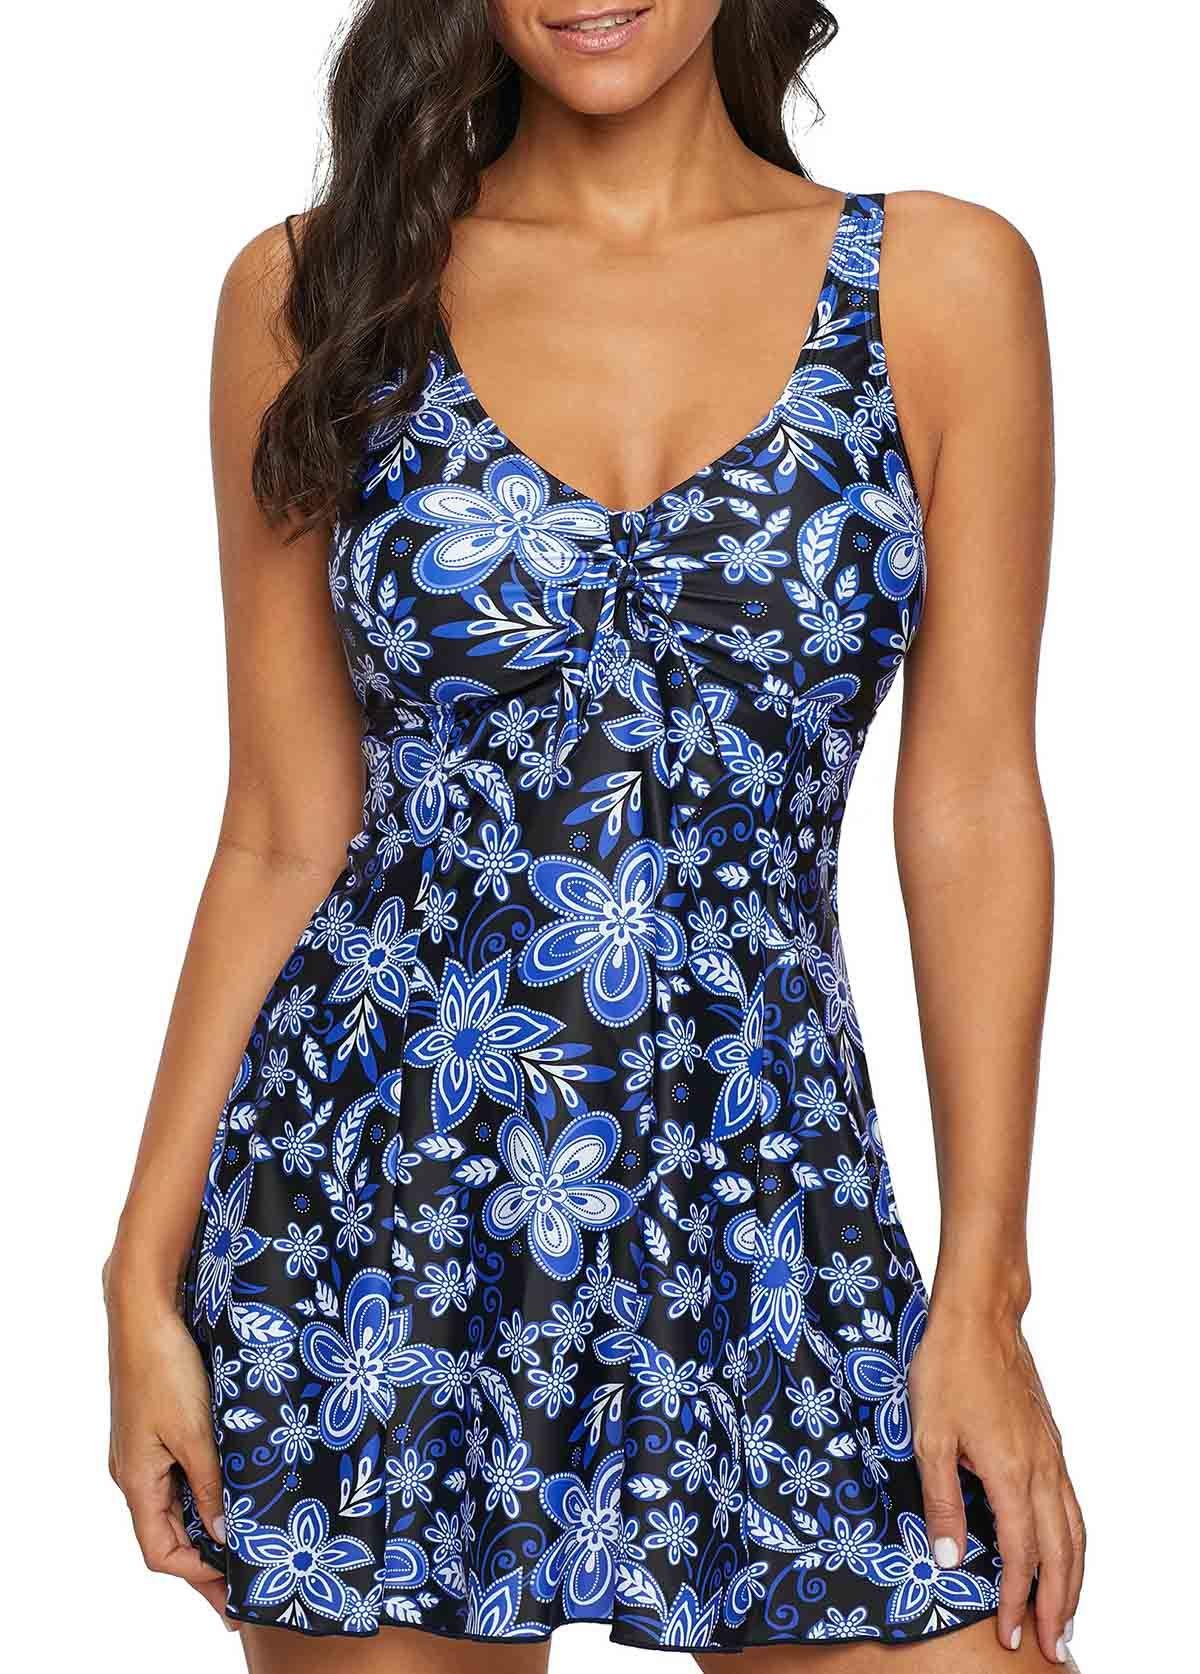 ffe59717dff95 V Neck Floral Print Swimdress and Shorts | liligal.com - USD $27.37  #liligal #swimwear #swimsuit